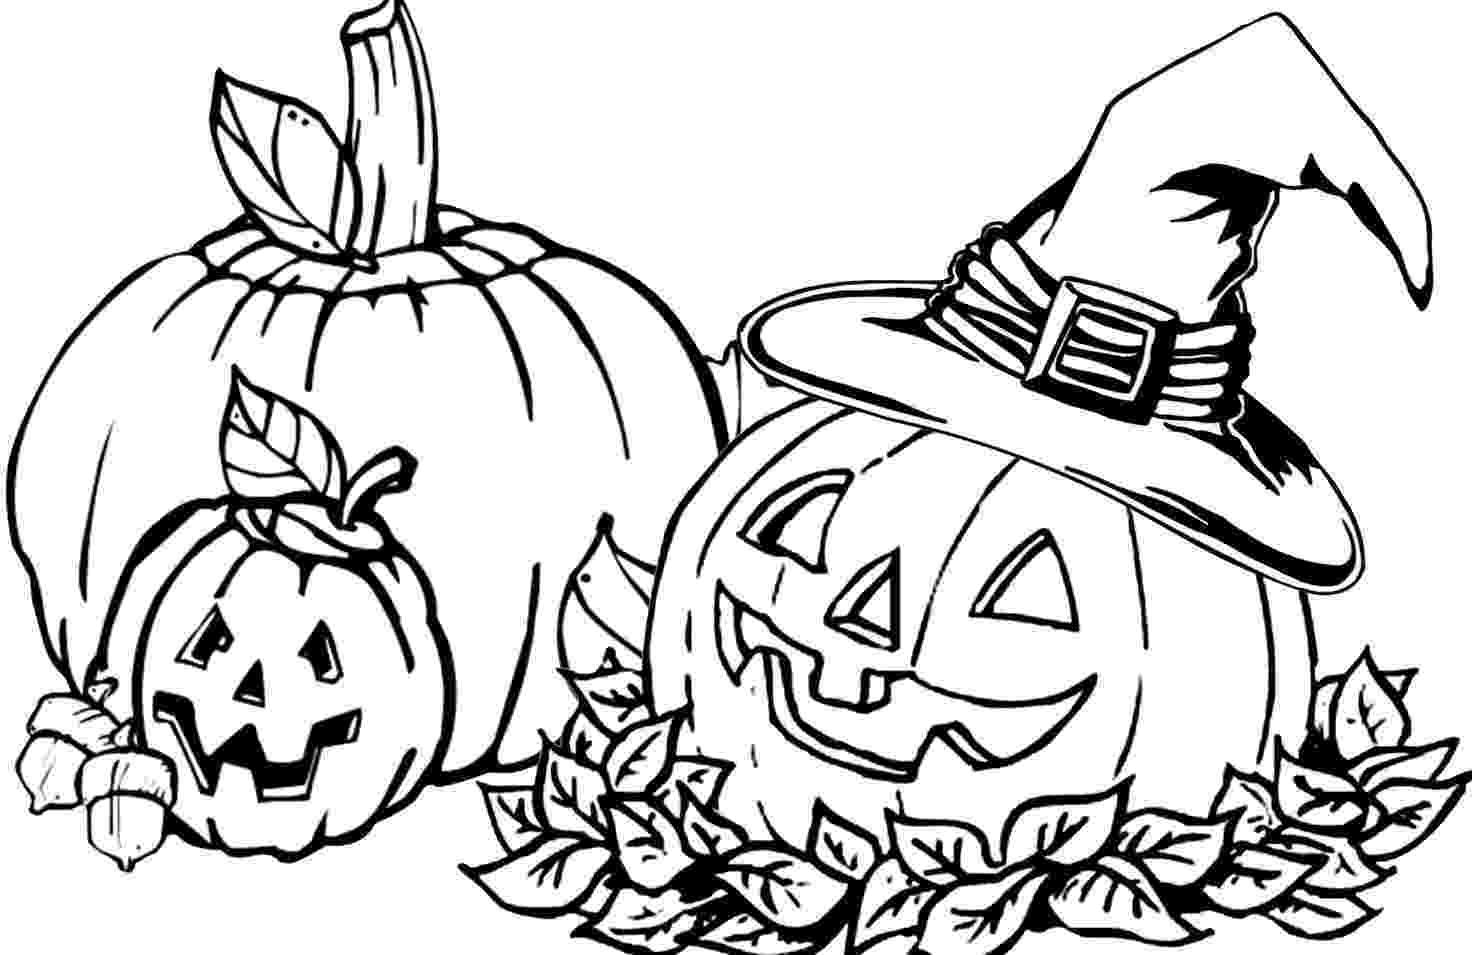 halloween pumpkin coloring pages pumpkin coloring pages 360coloringpages coloring pages pumpkin halloween